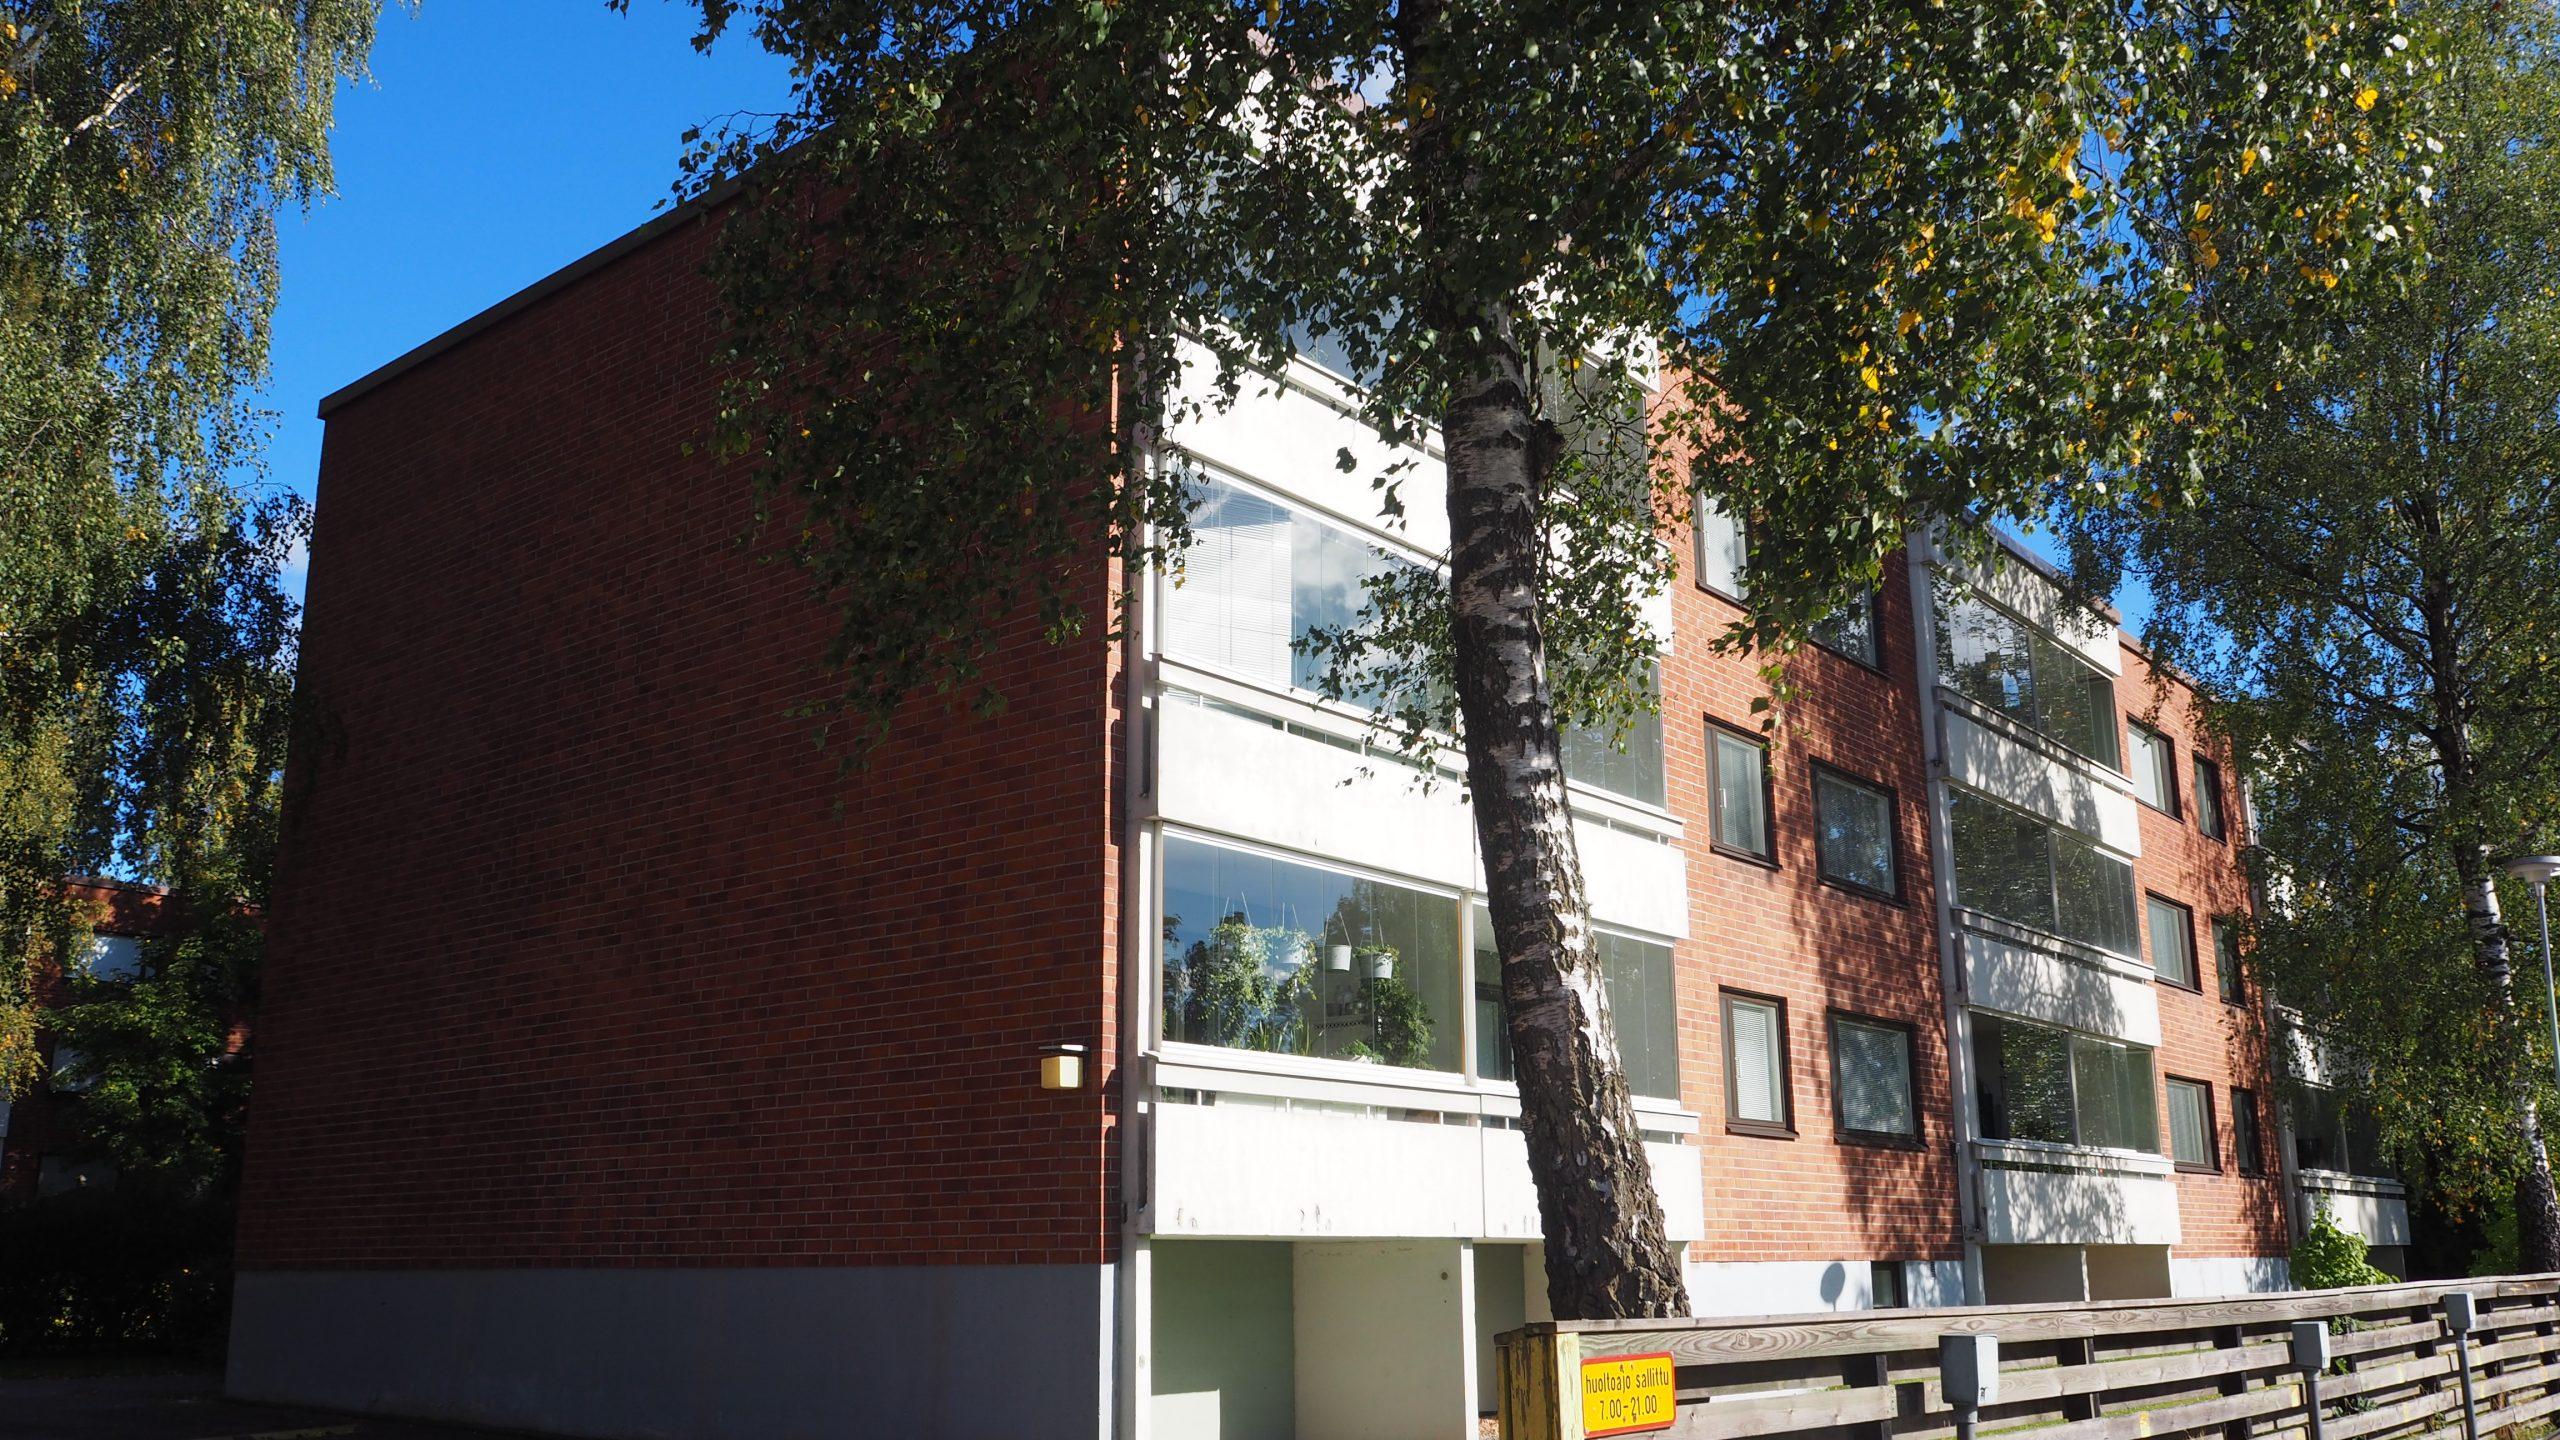 59 m² Hirsipadontie 7, Patola, Helsinki 2h, keittiö, kph